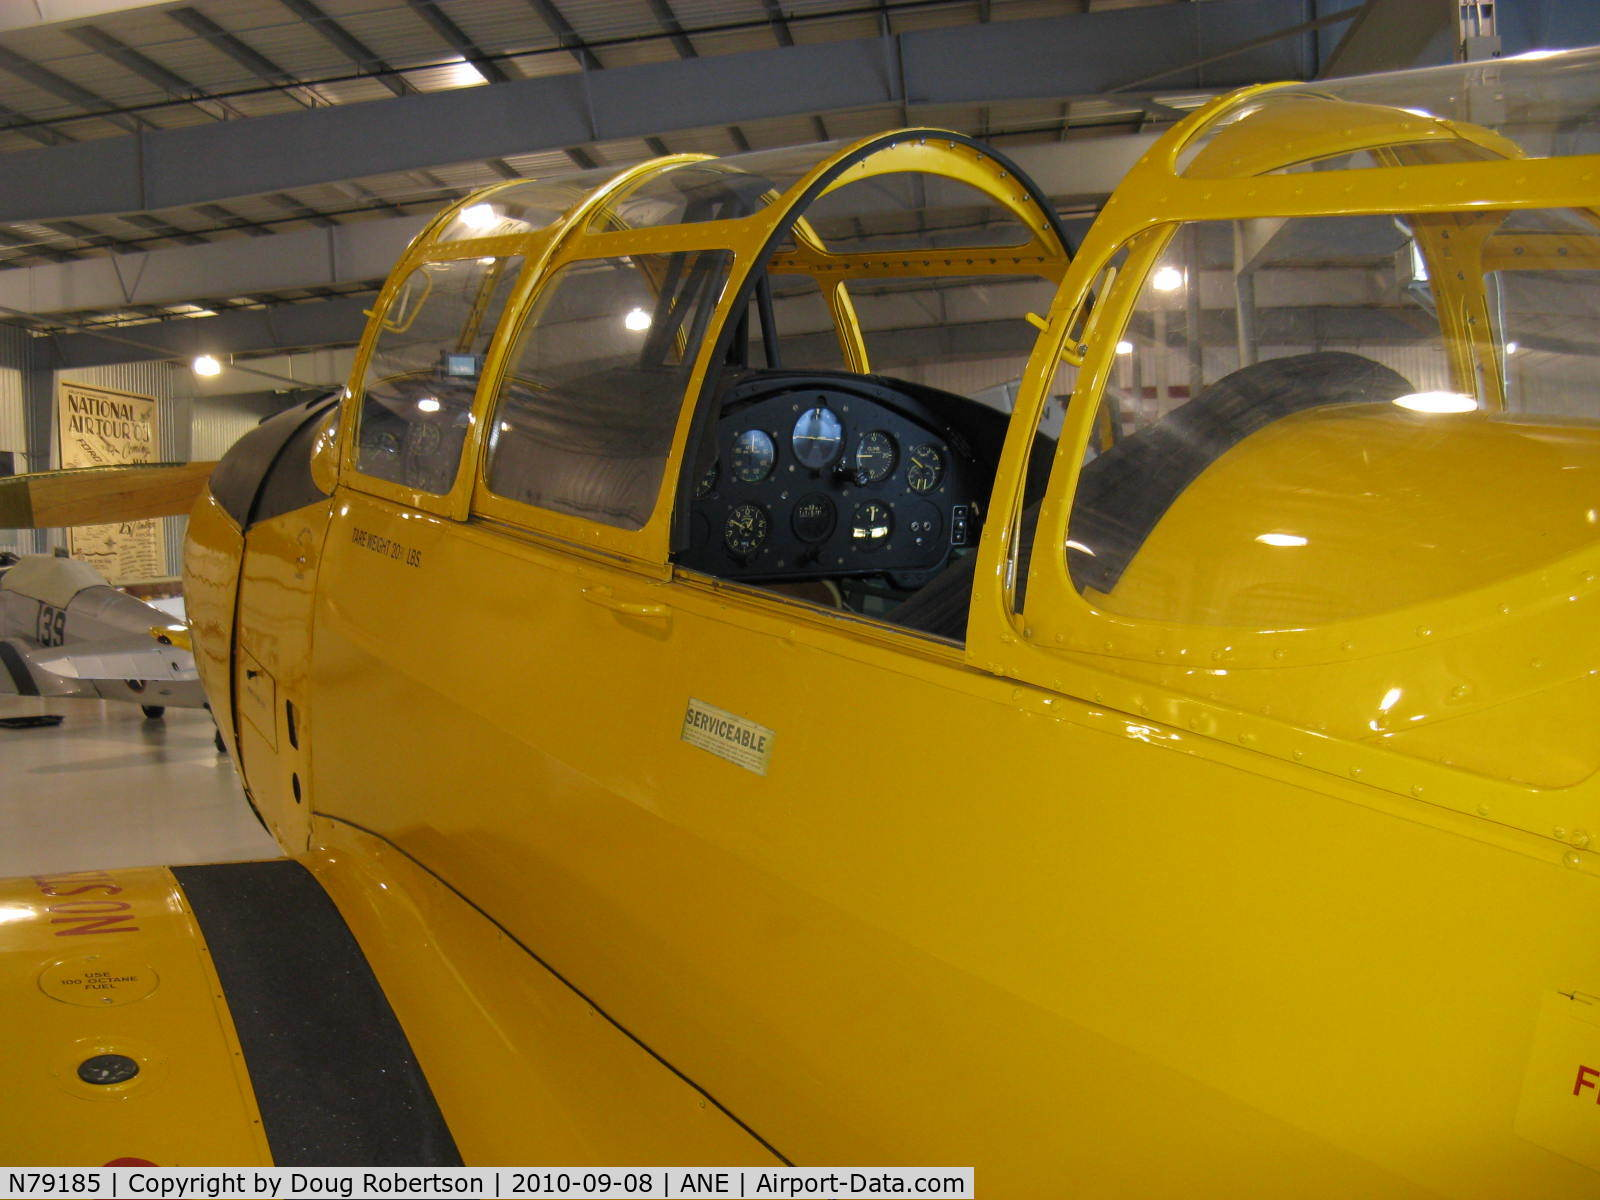 N79185, 1942 Fairchild M-62A-4 C/N FC180, 1942 Fairchild M-62A-4 as PT-26, Fairchild 6-440C-2 175 Hp, cockpits, at Golden Wings Museum